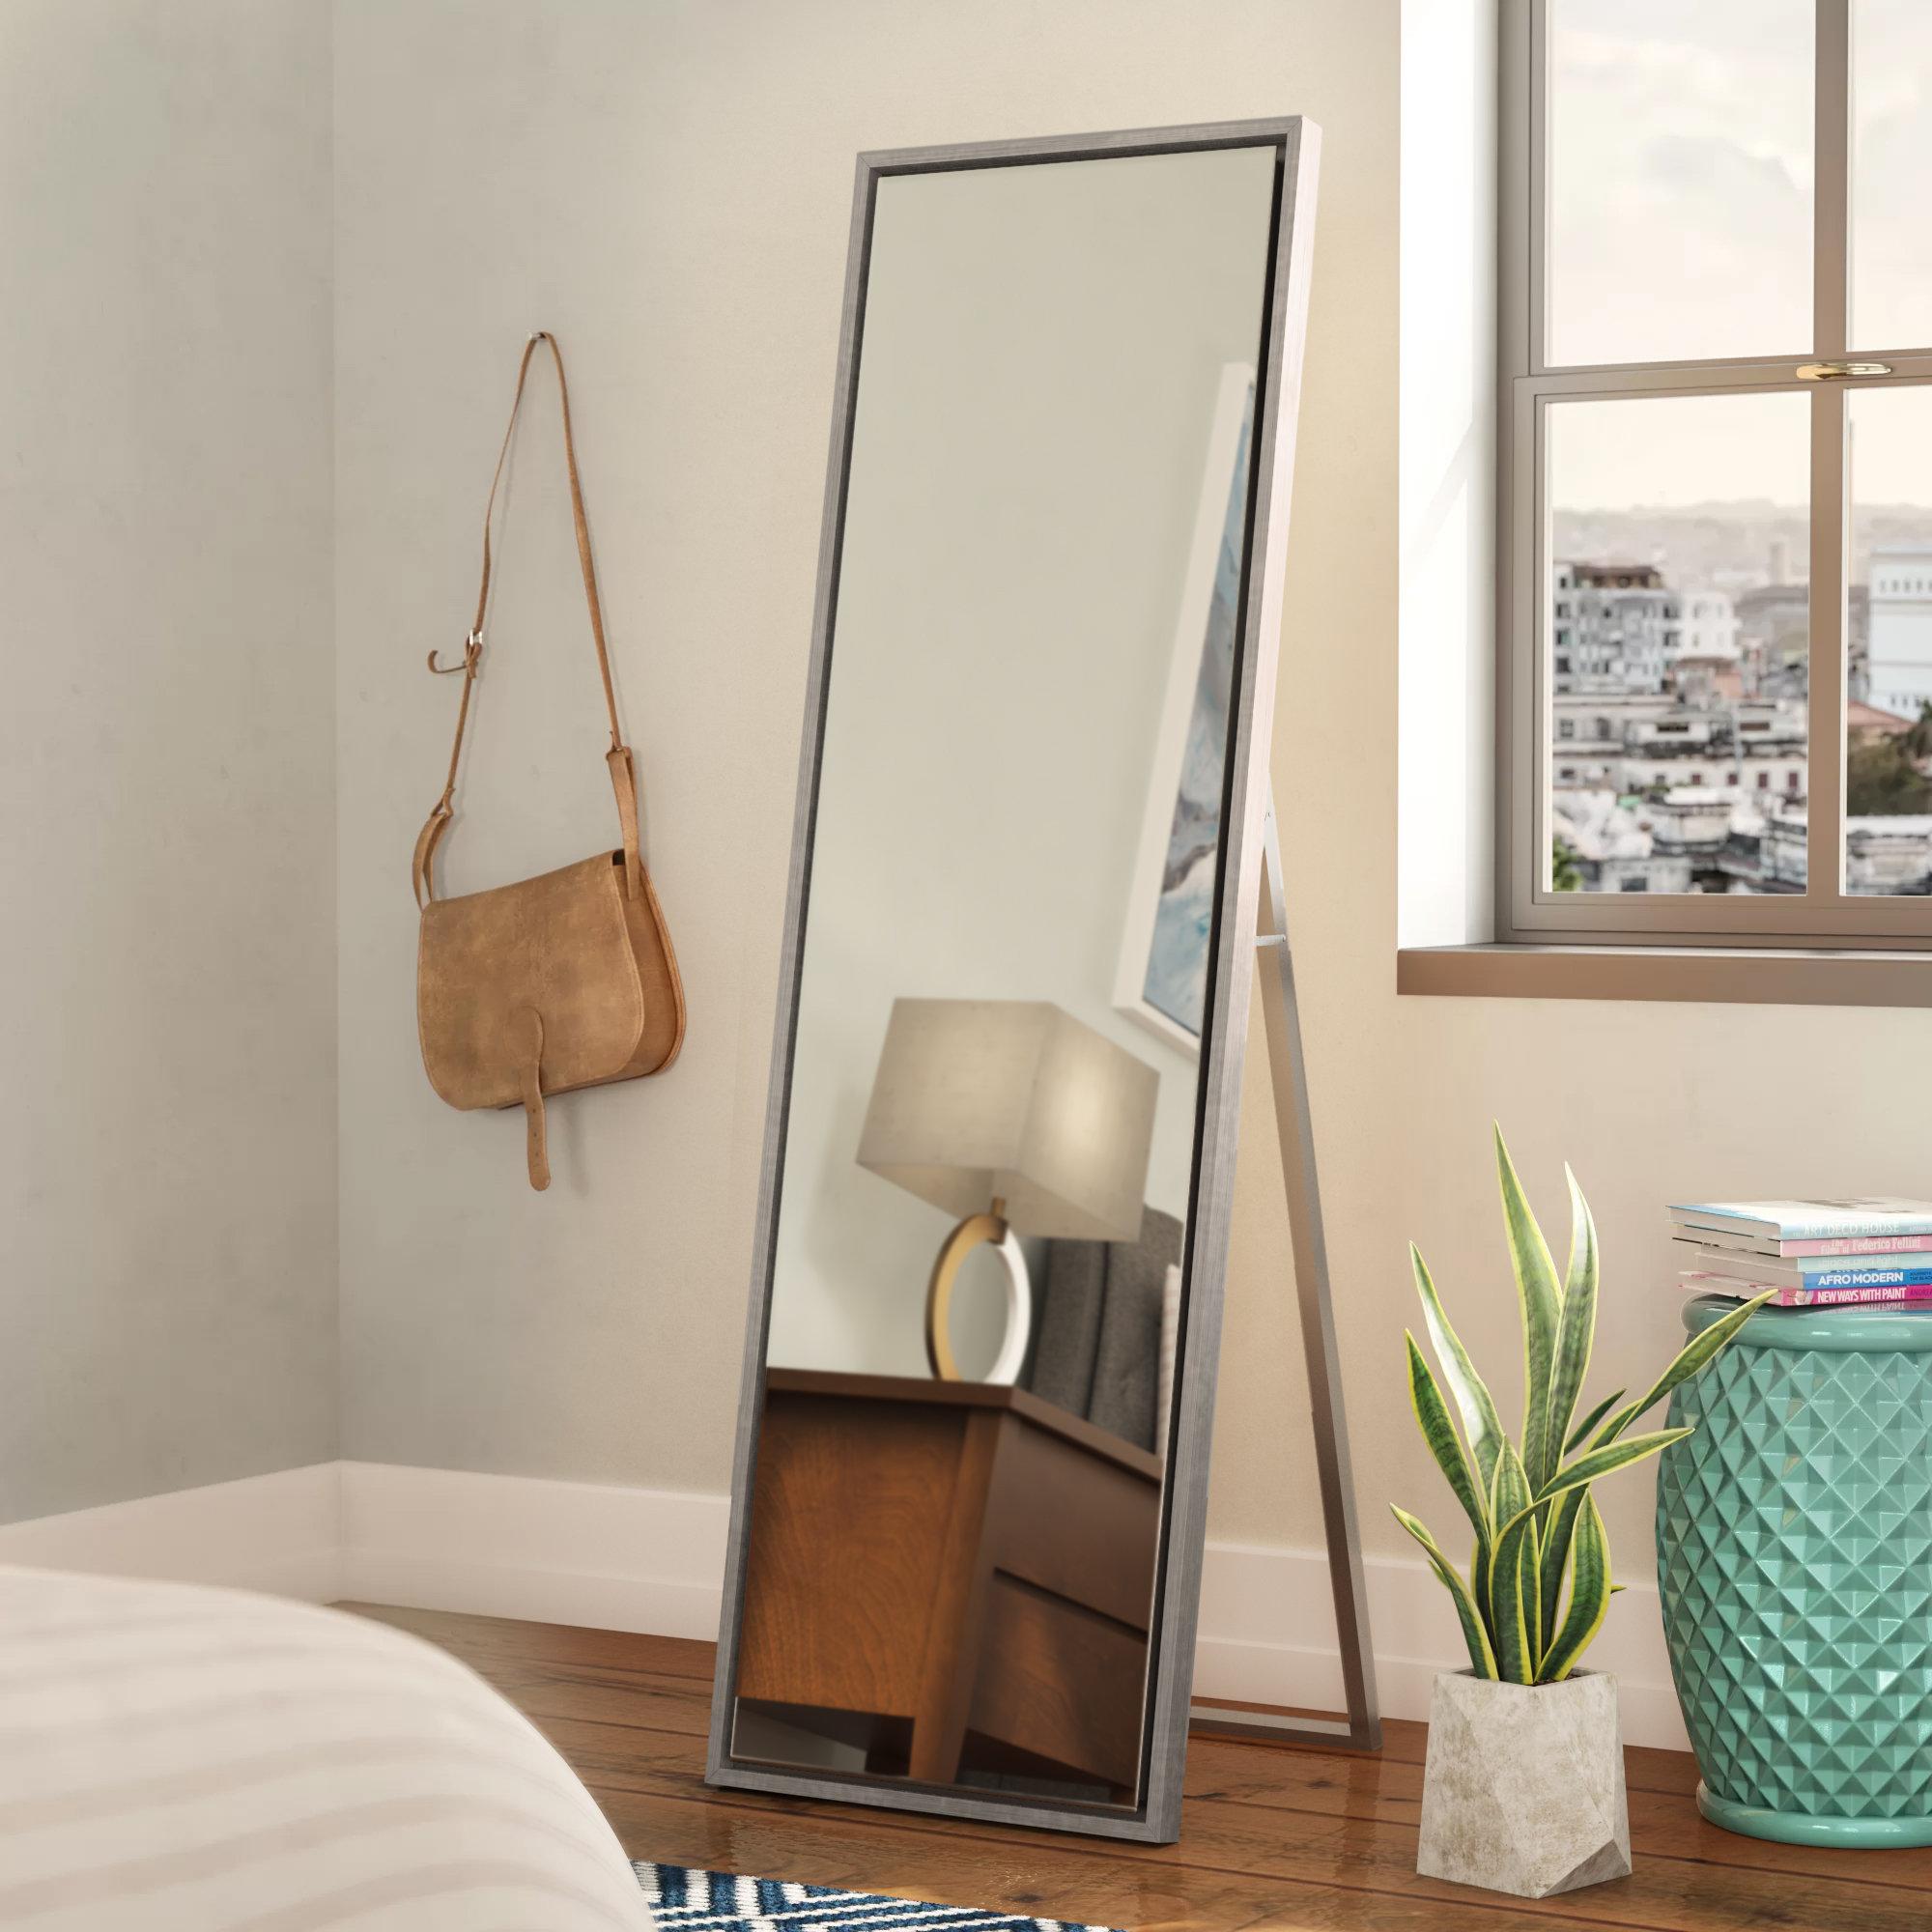 Etonnant Brayden Studio Whitakers Wood Framed Easel Free Standing Full Length Mirror  U0026 Reviews | Wayfair